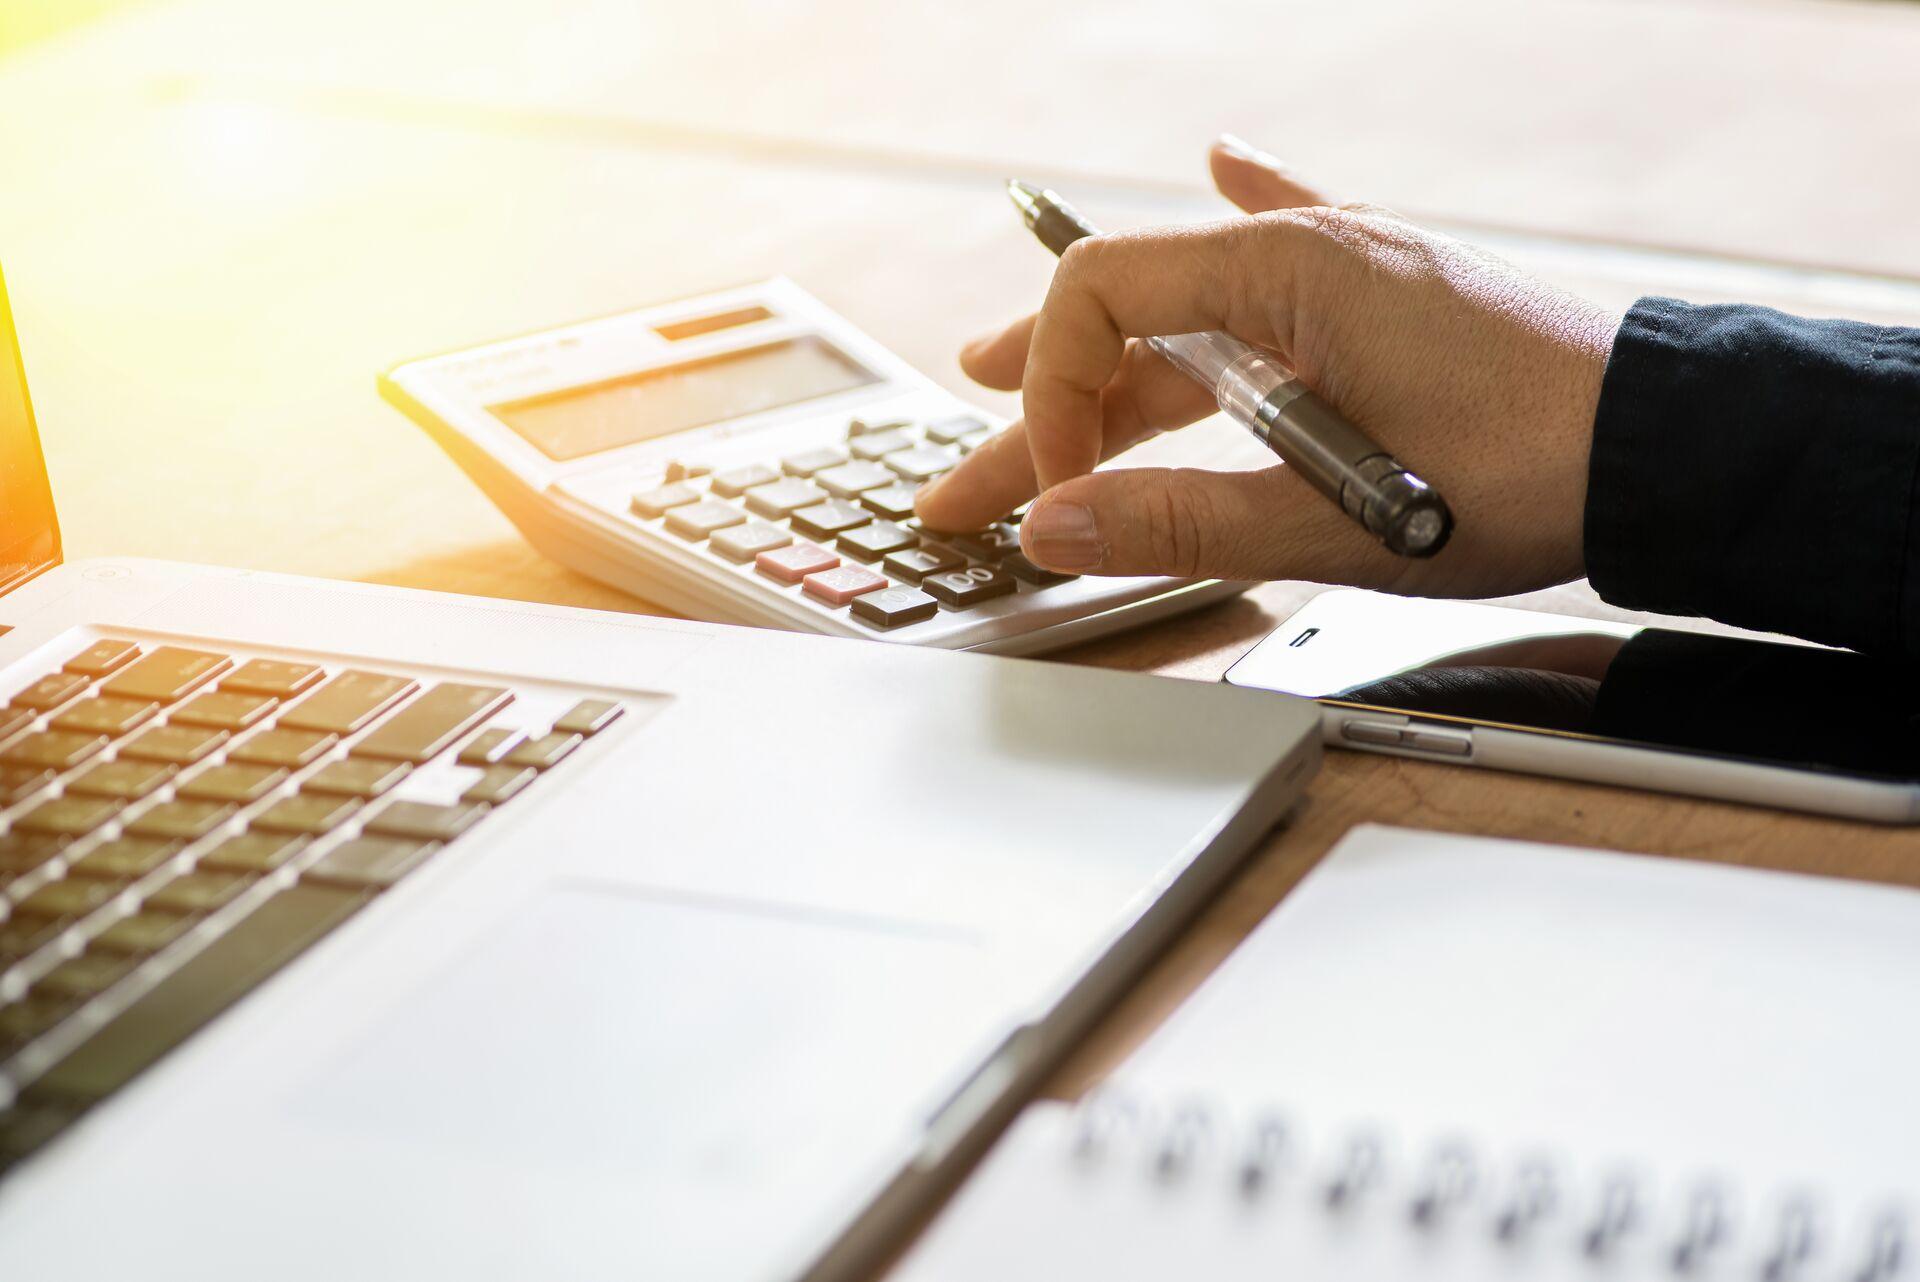 senior calculating the cost of senior living using a calculator